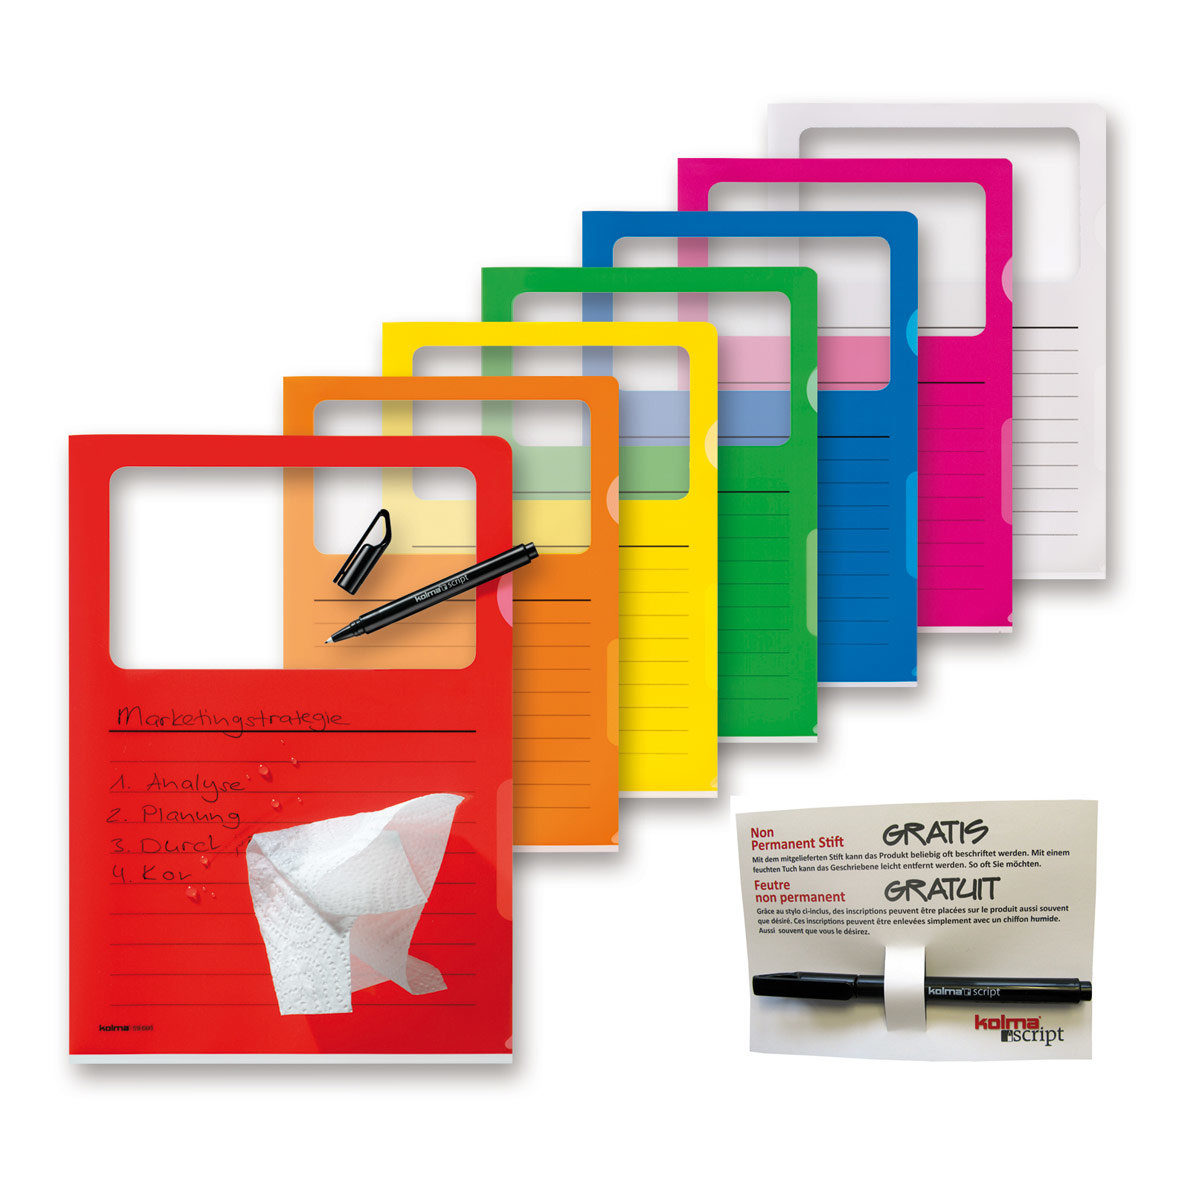 visa dossier script set farbenrein kolma e1532108549941